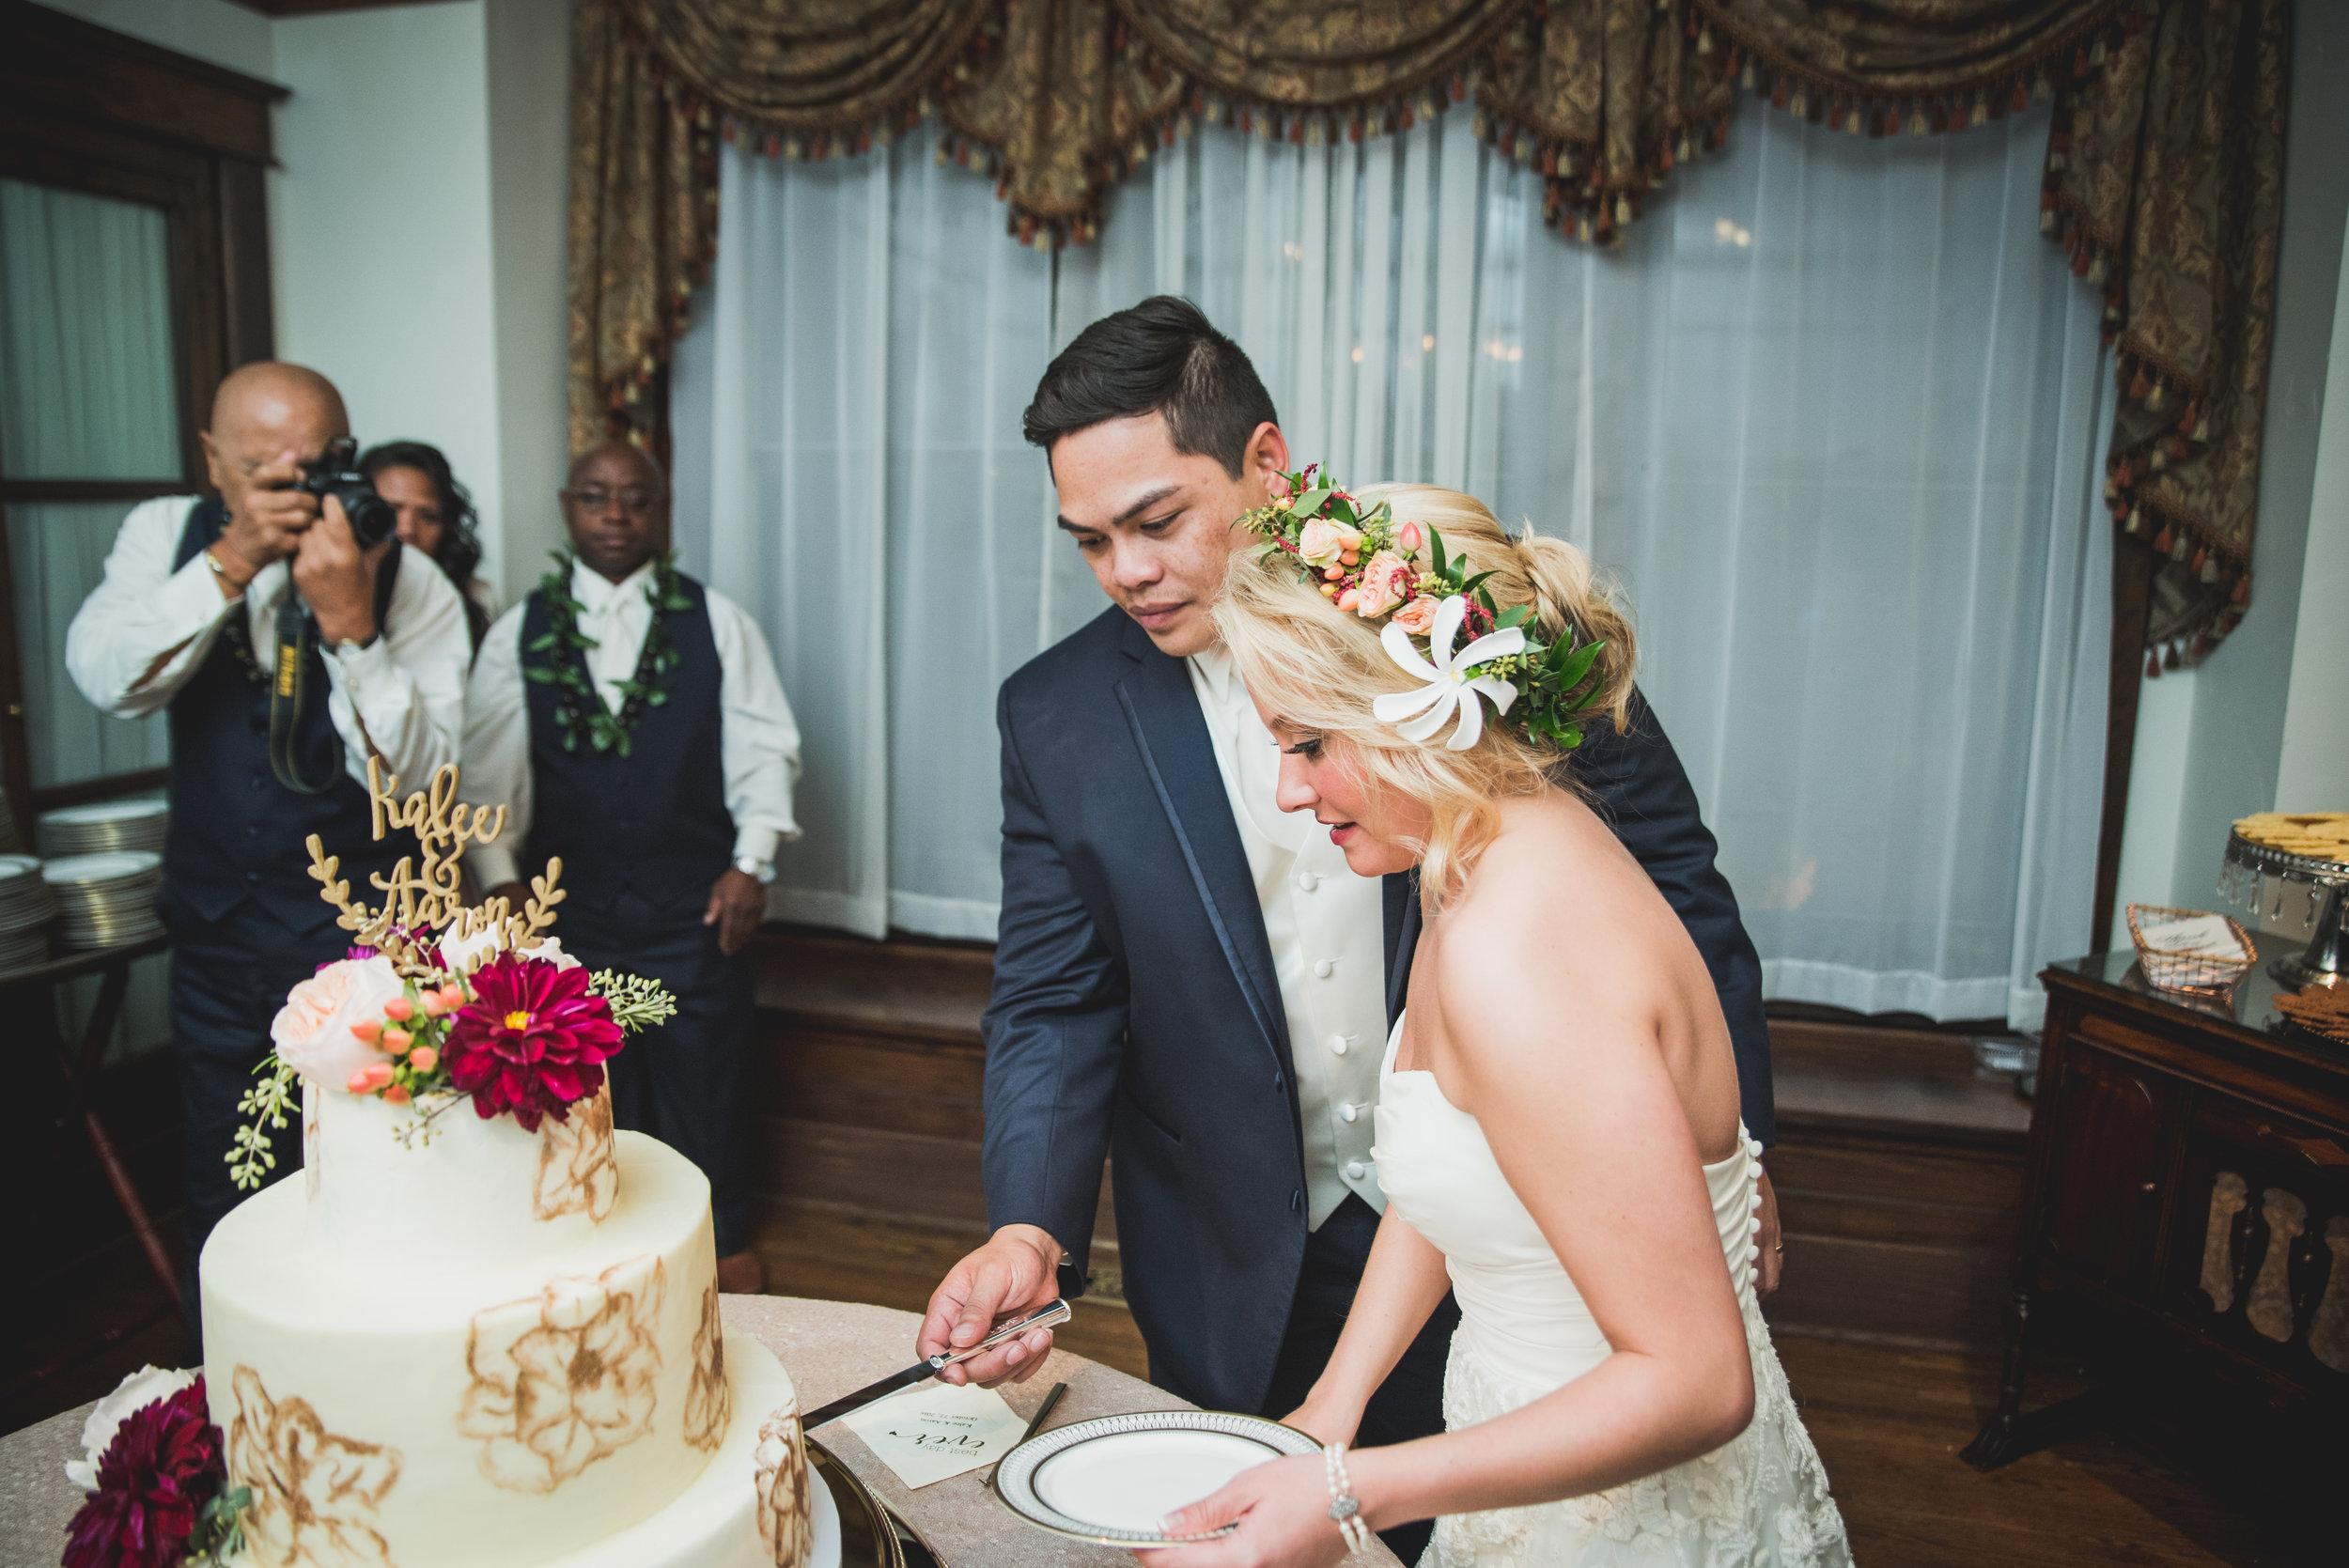 Nashville-wedding-photographers-CJ's-Off-The-Square-64.JPG